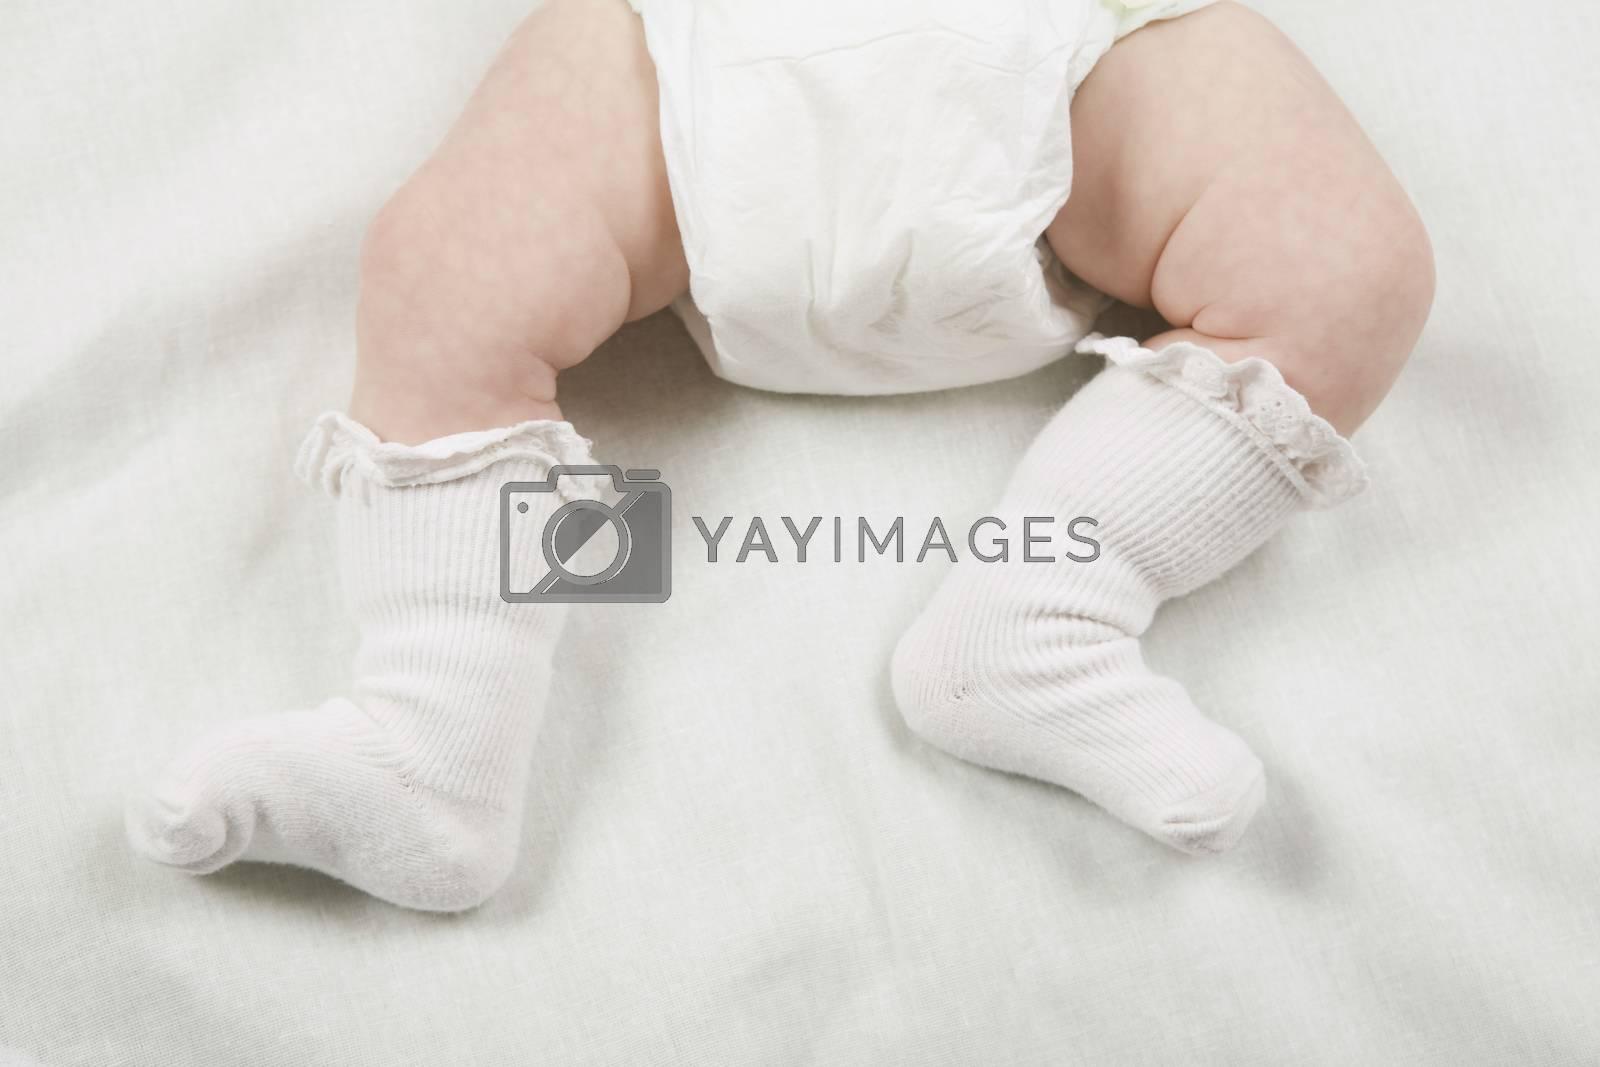 Socks on babies feet close-up by moodboard